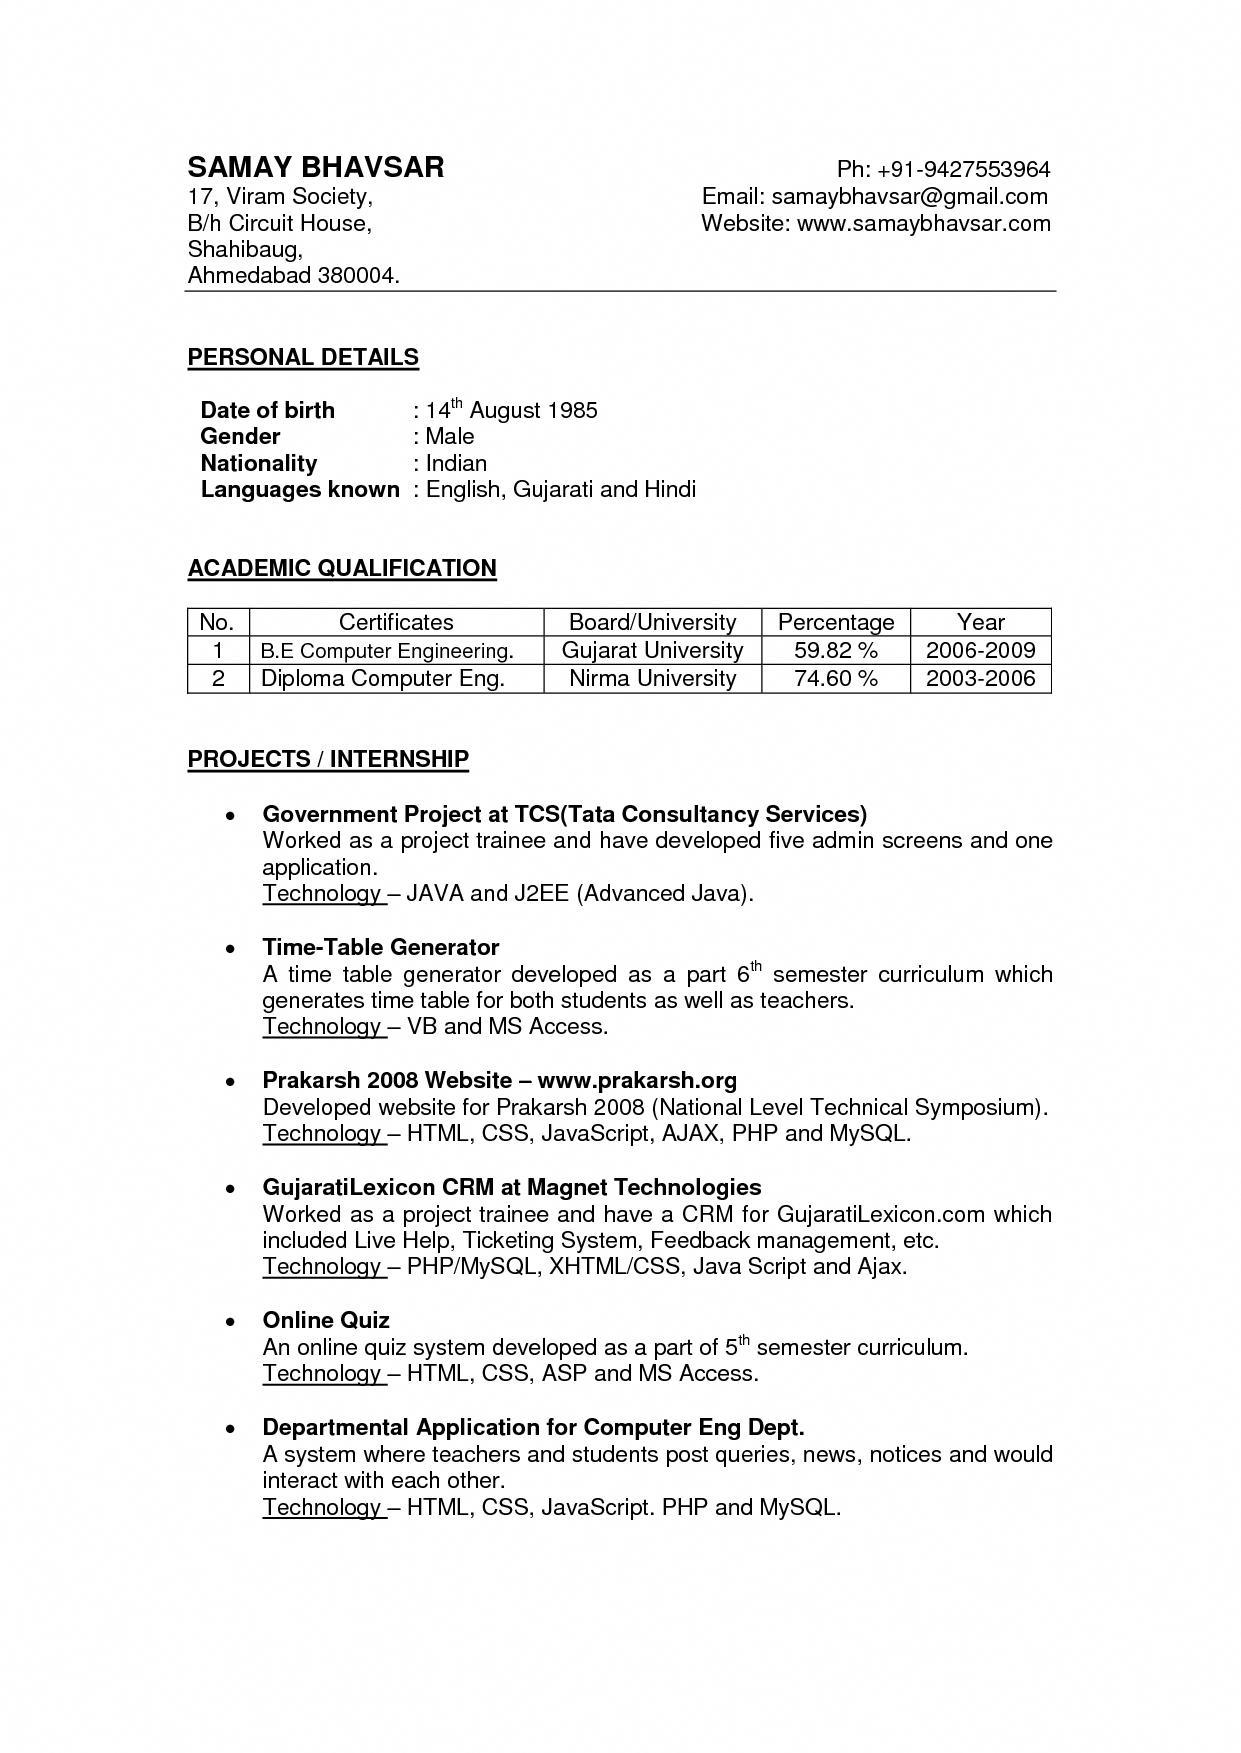 Free Resume Templates India Freeresumetemplates India Resume